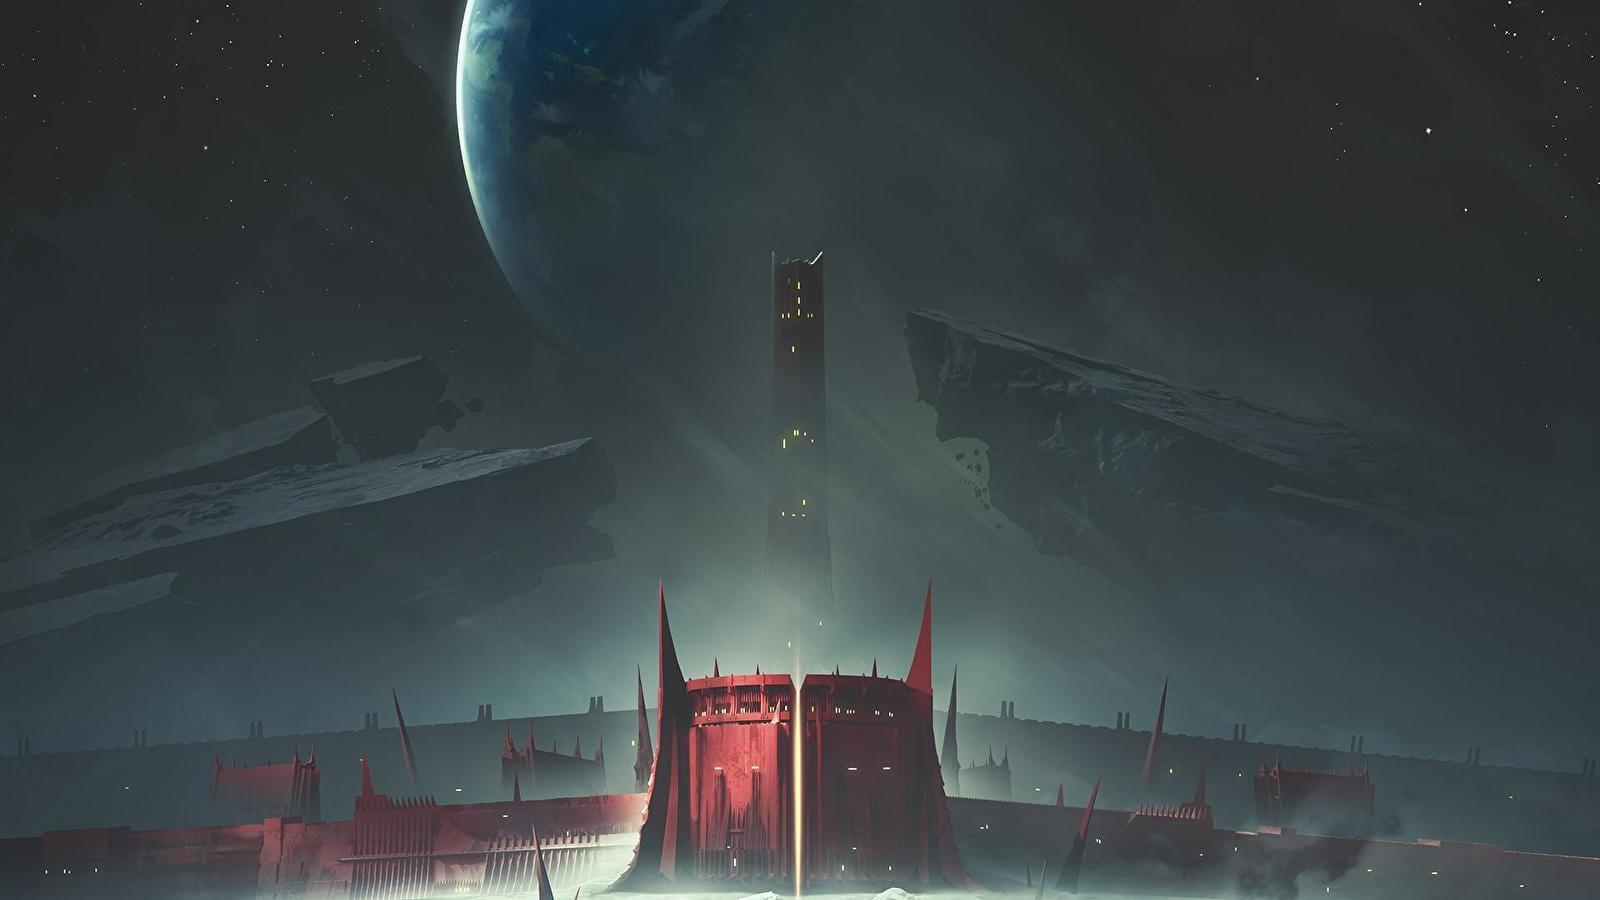 destiny 2, shadowkeep, story, ending, explained